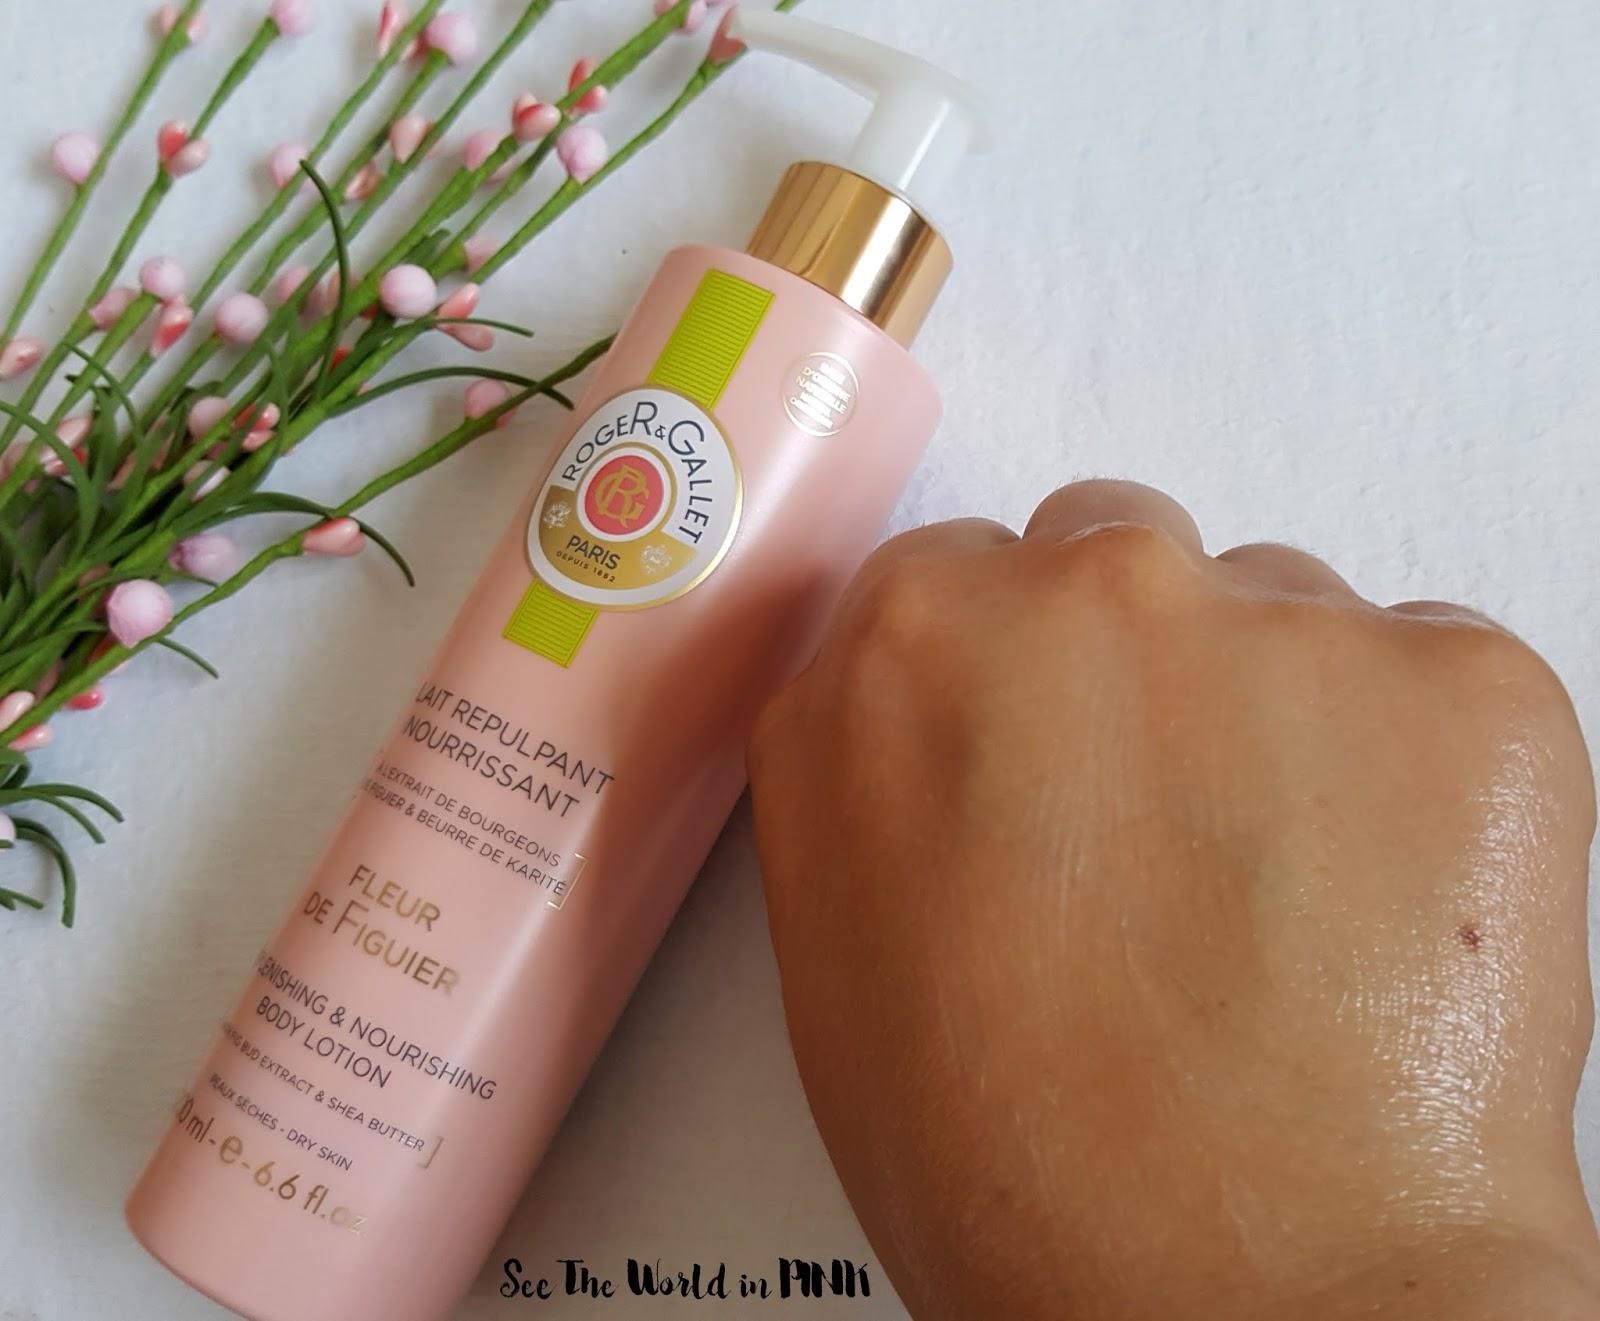 Skincare Sunday - Roger & Gallet Fleur de Figuier Replenishing & Nourishing Body Lotion Review!